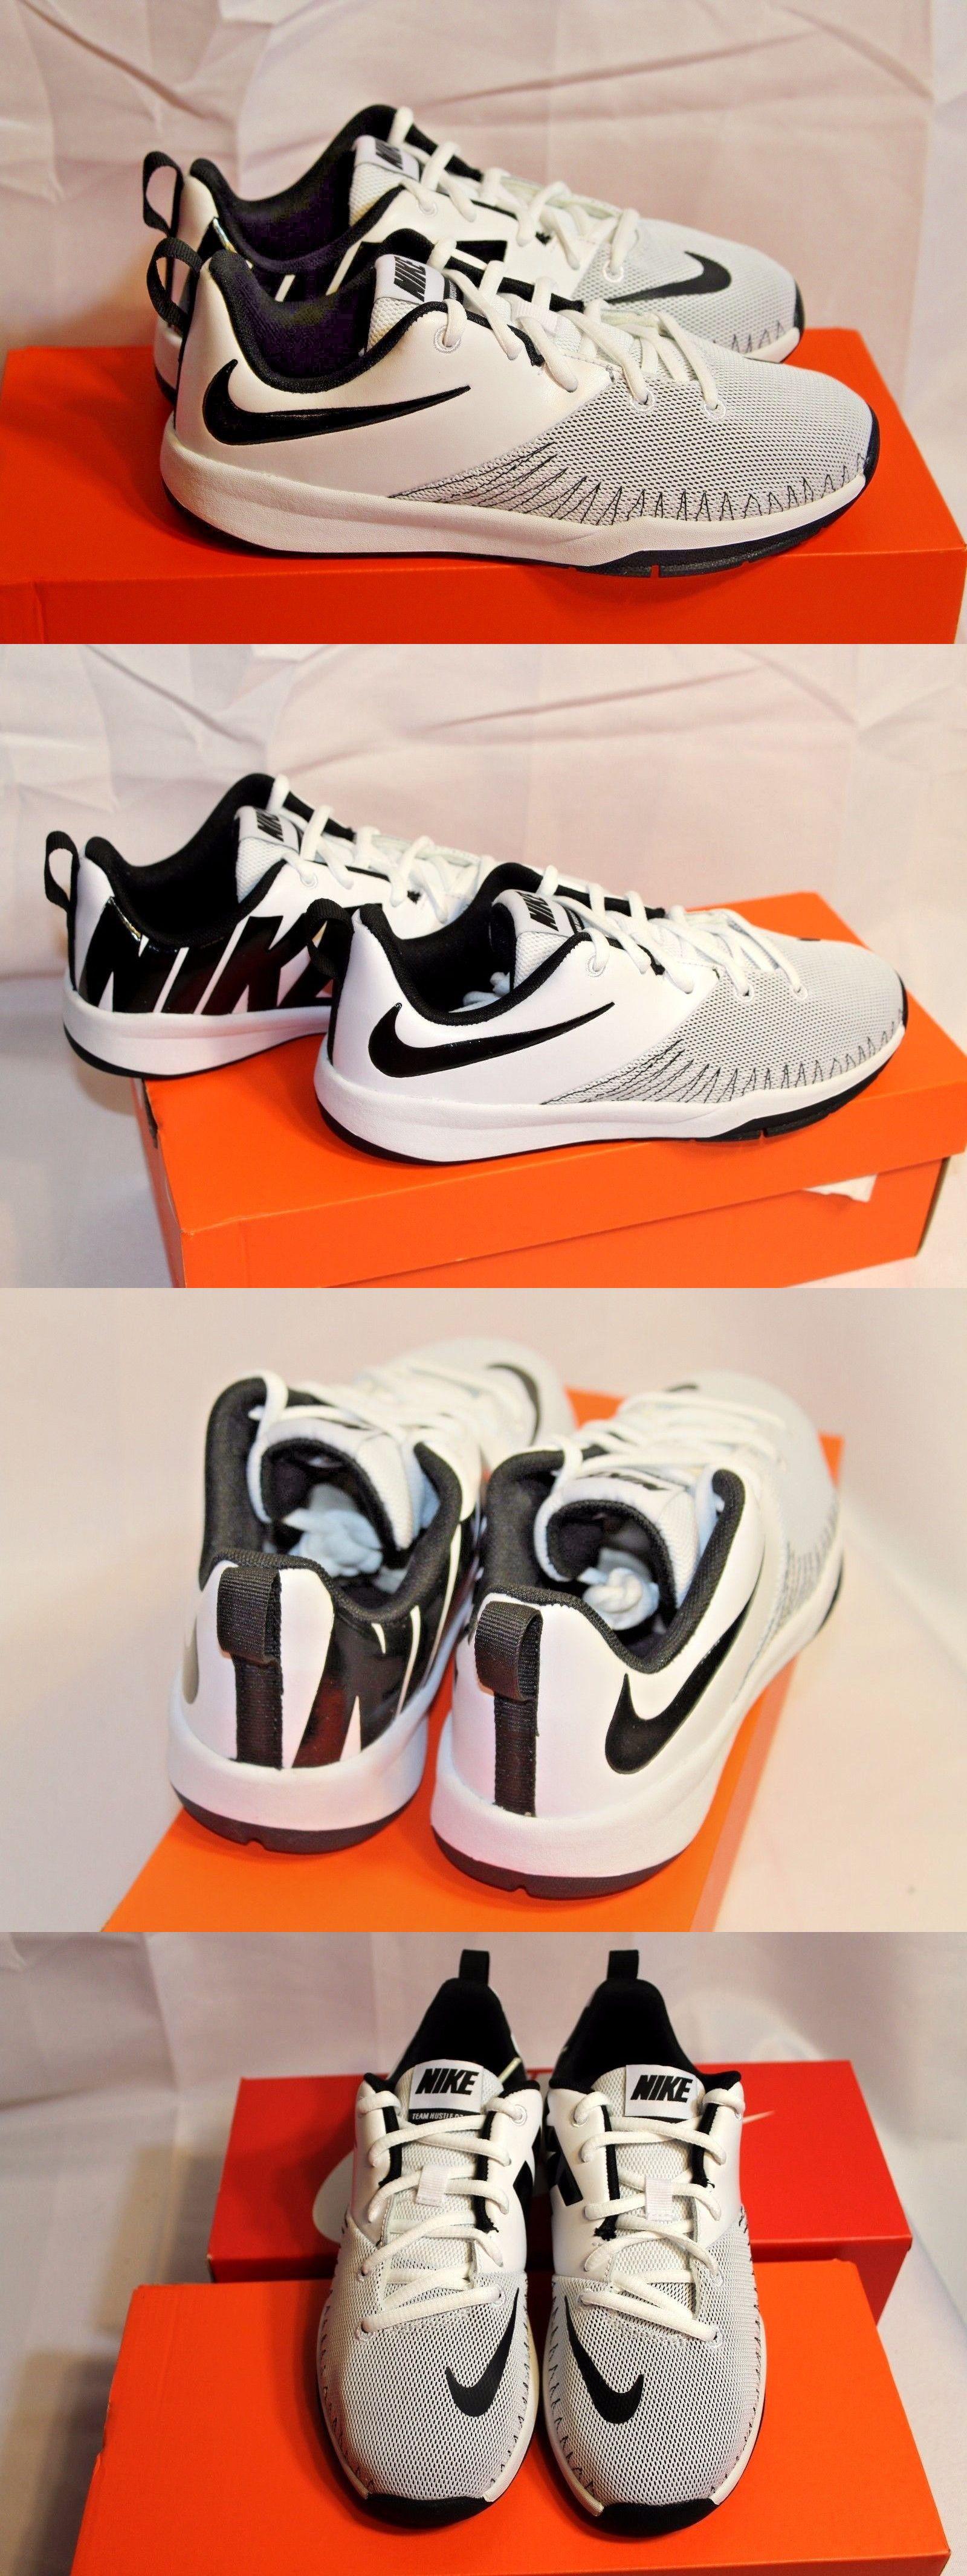 e9f334c039eb Boys Shoes 57929  New School Age Nike Team Hustle D7 Low White Black  Basketball Athletic